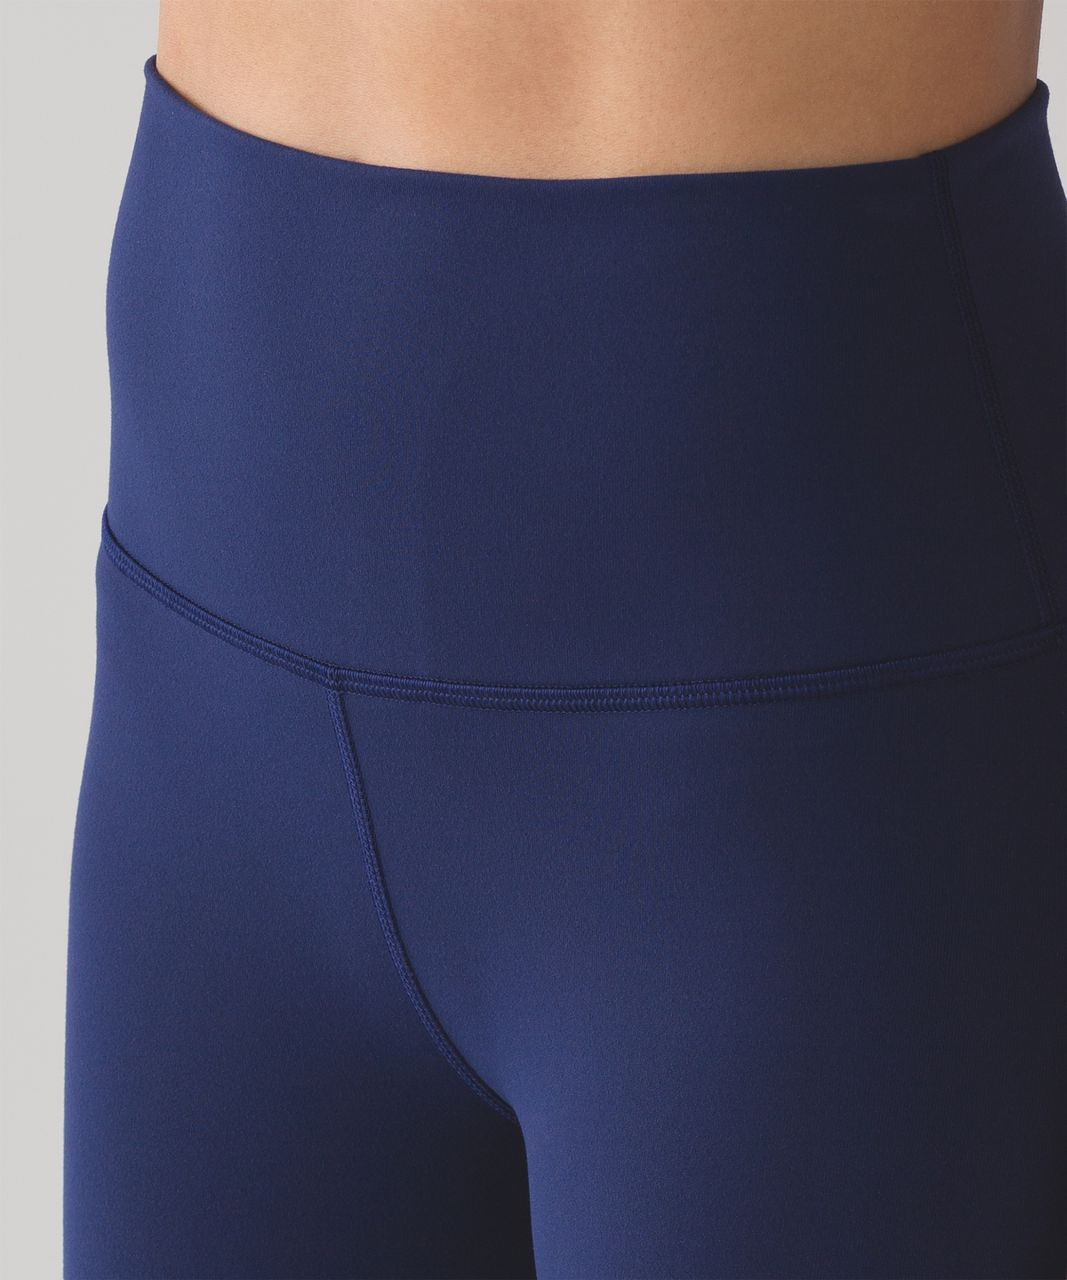 Lululemon High Times Pant - Hero Blue